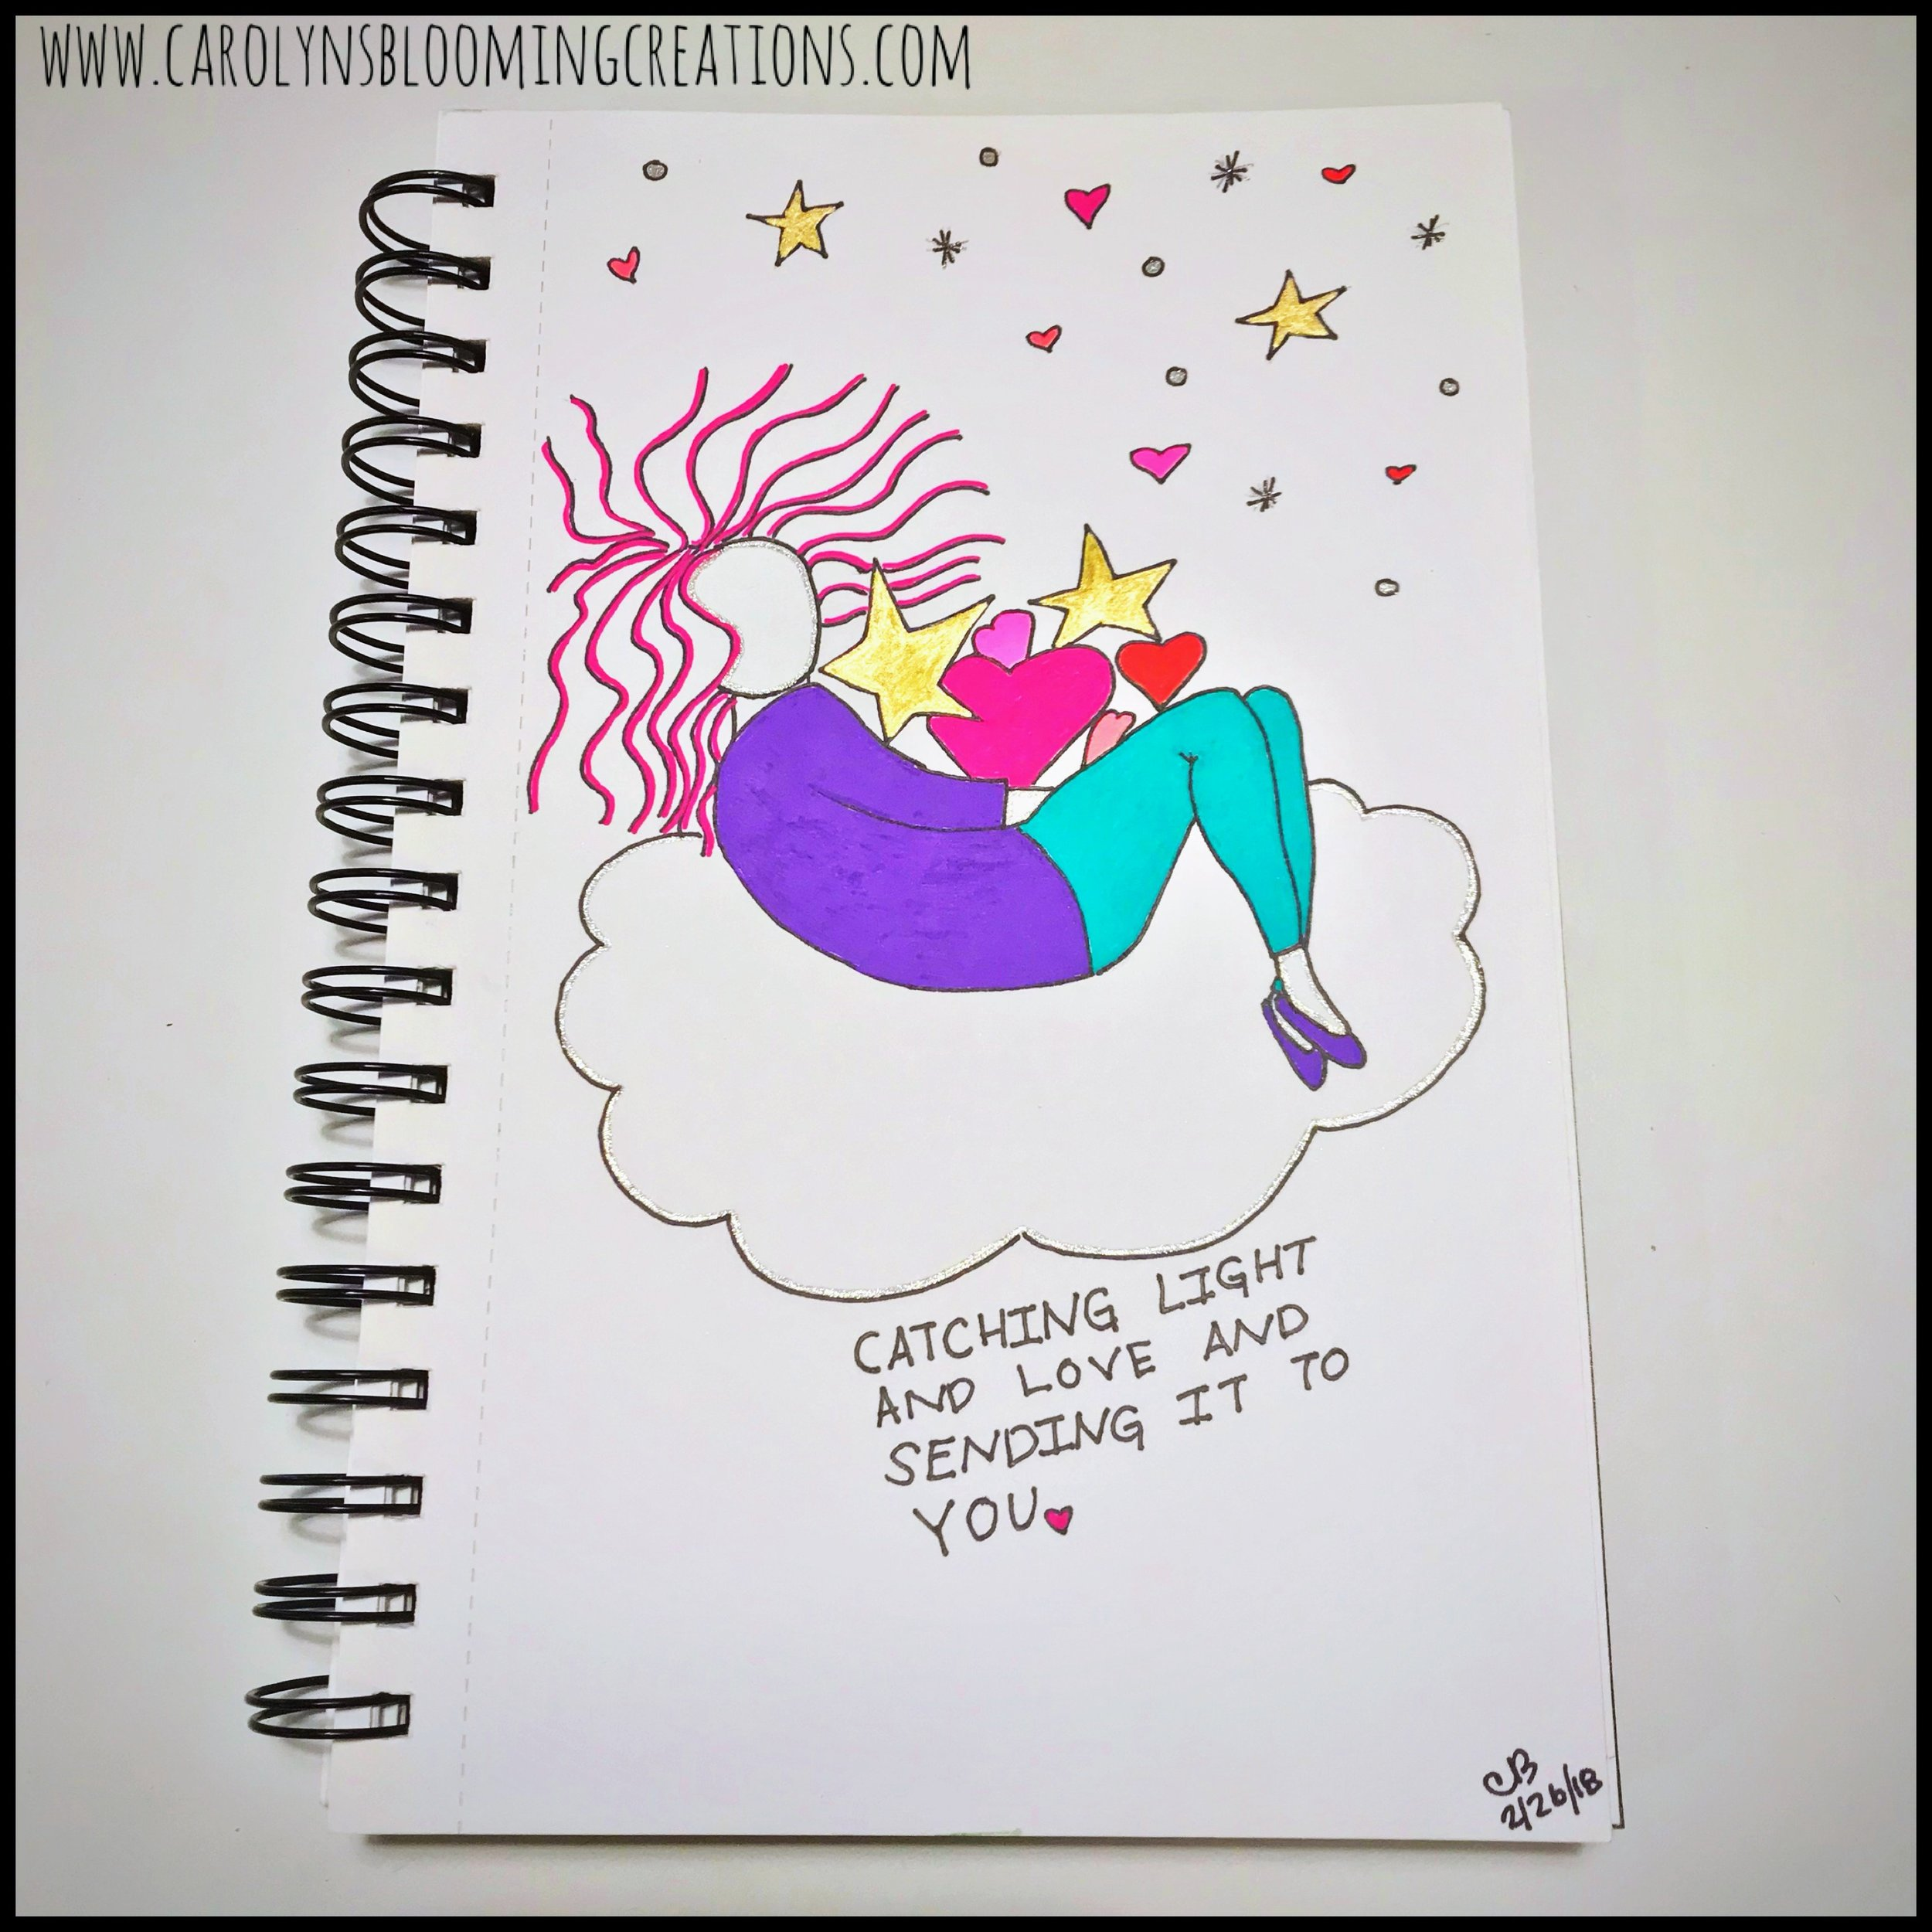 Sketch by Carolyn J. Braden: Sending Light and Love to You